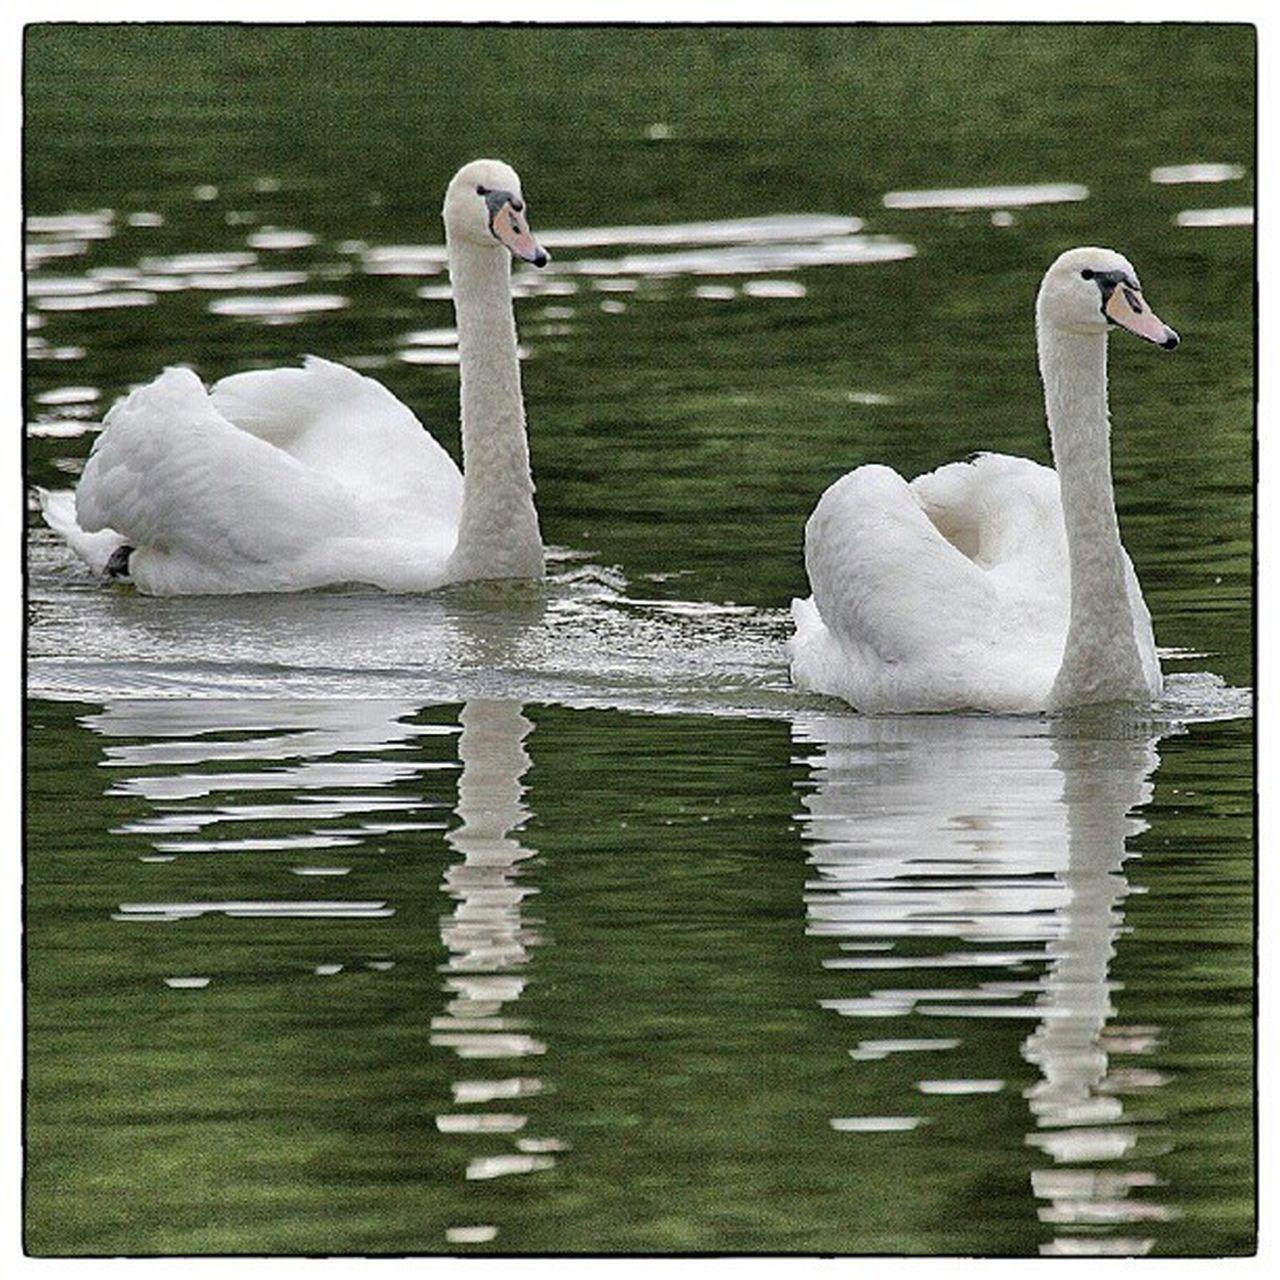 Igersslovenia Igersljubljana Swans Instagood photooftheday instamood igers picoftheday igdaily bestoftheday